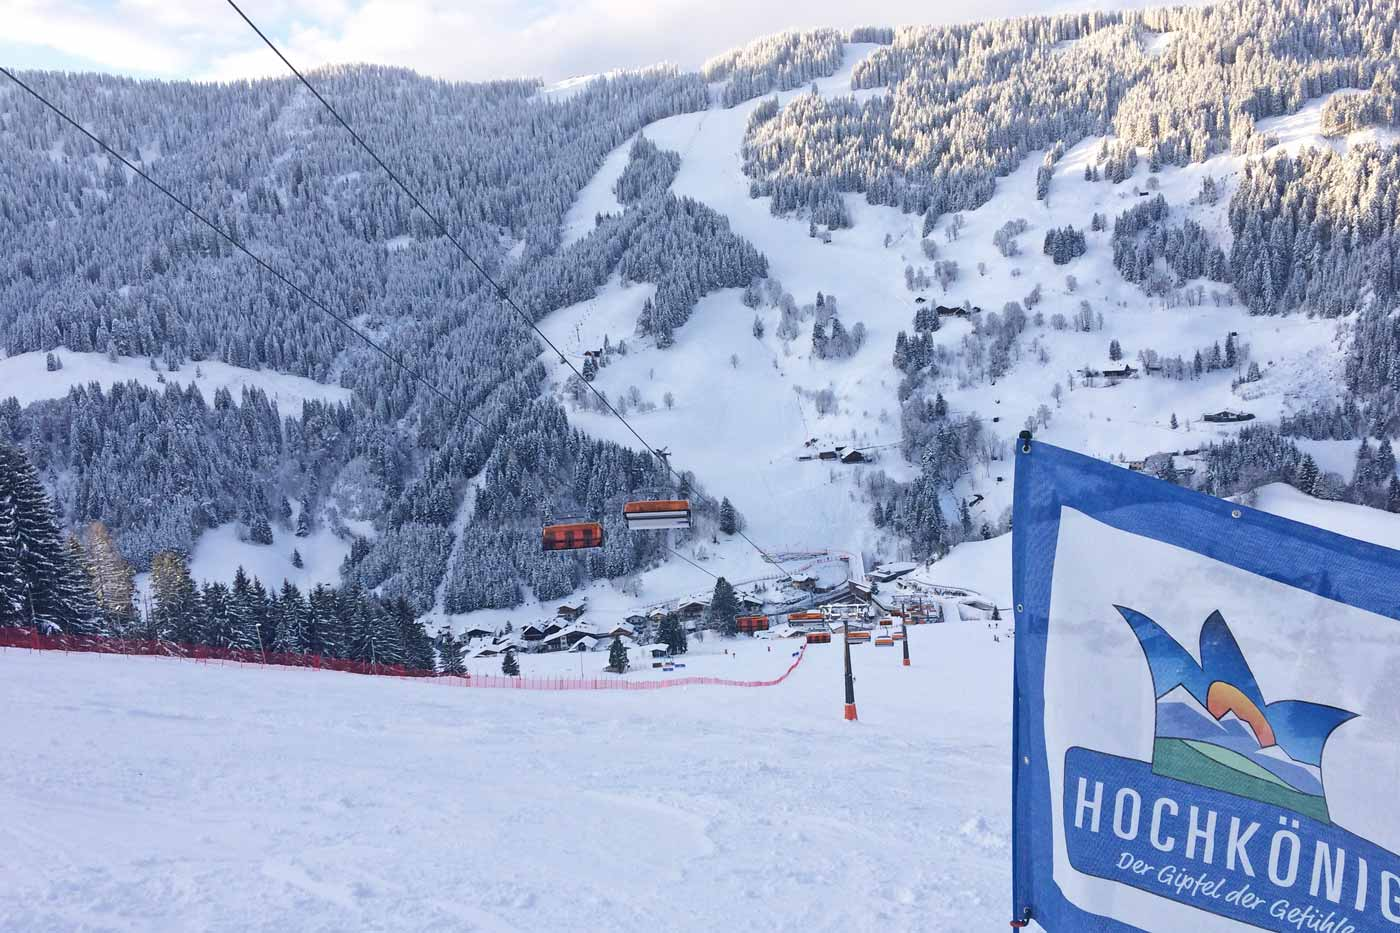 Piste en skilift in skigebied Hochkönig